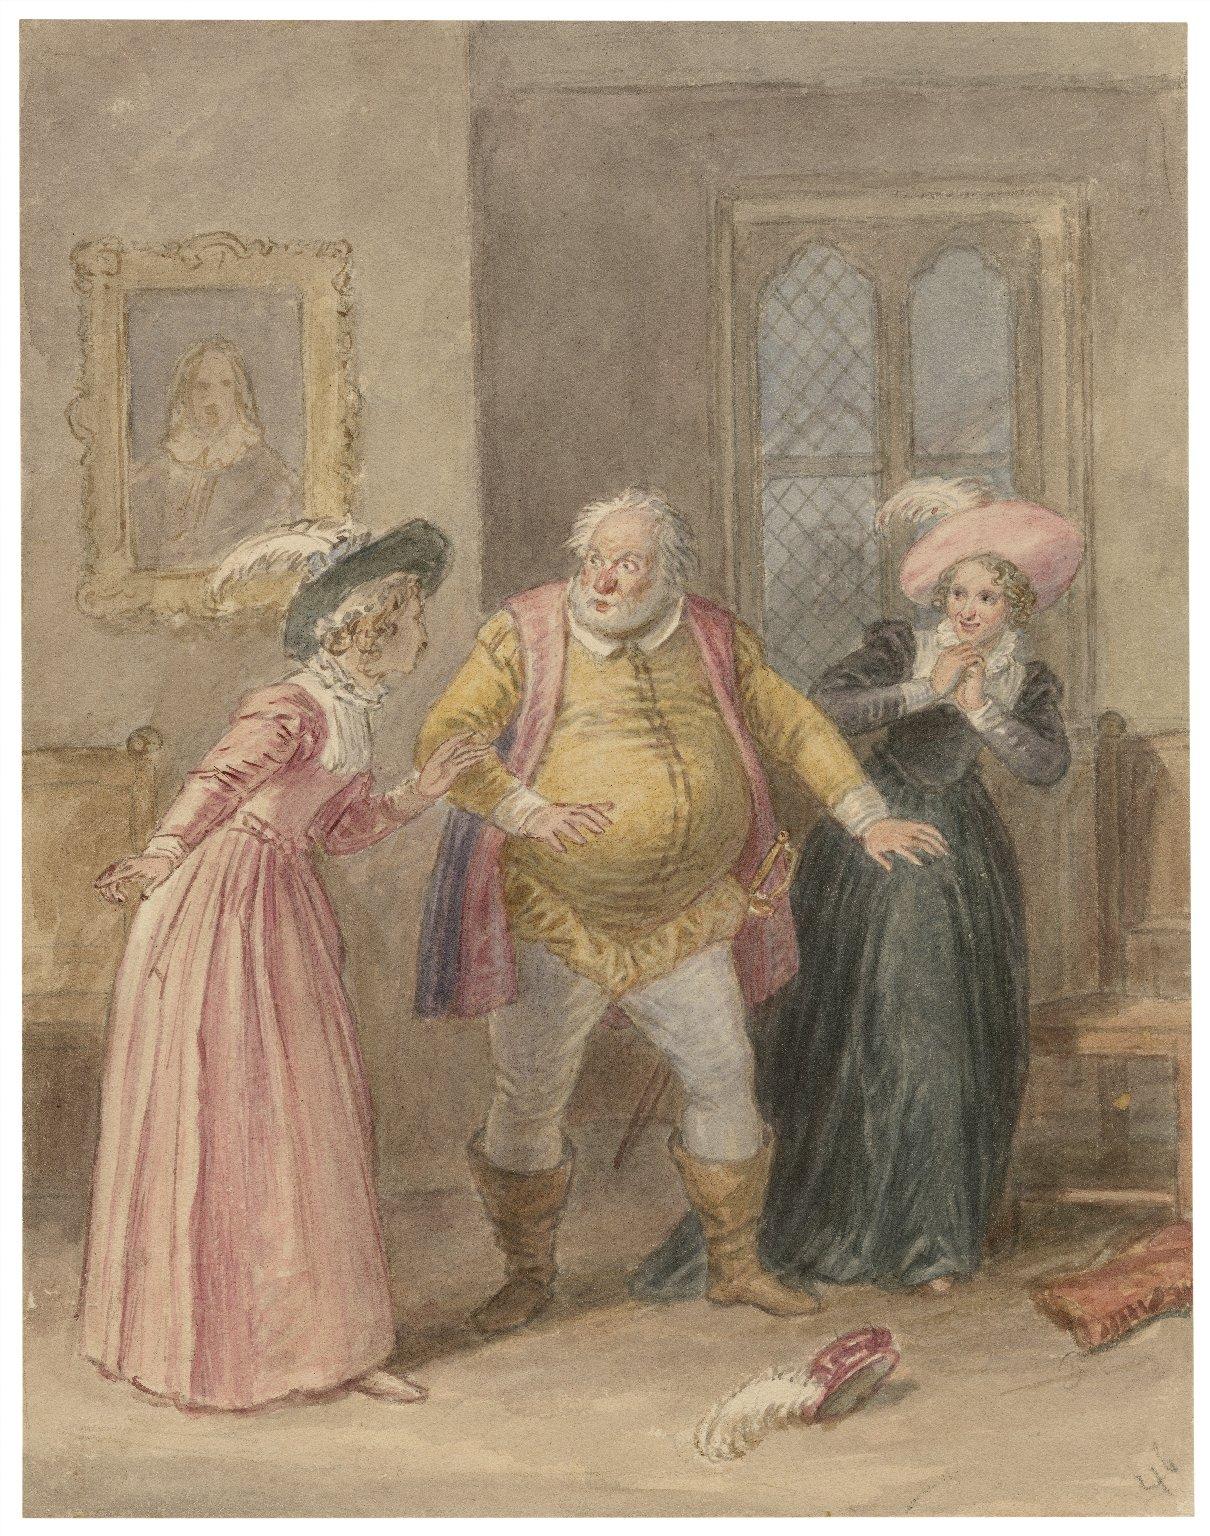 [Illustrations to Shakespeare's Falstaff plays] [graphic] / [John Massey Wright].